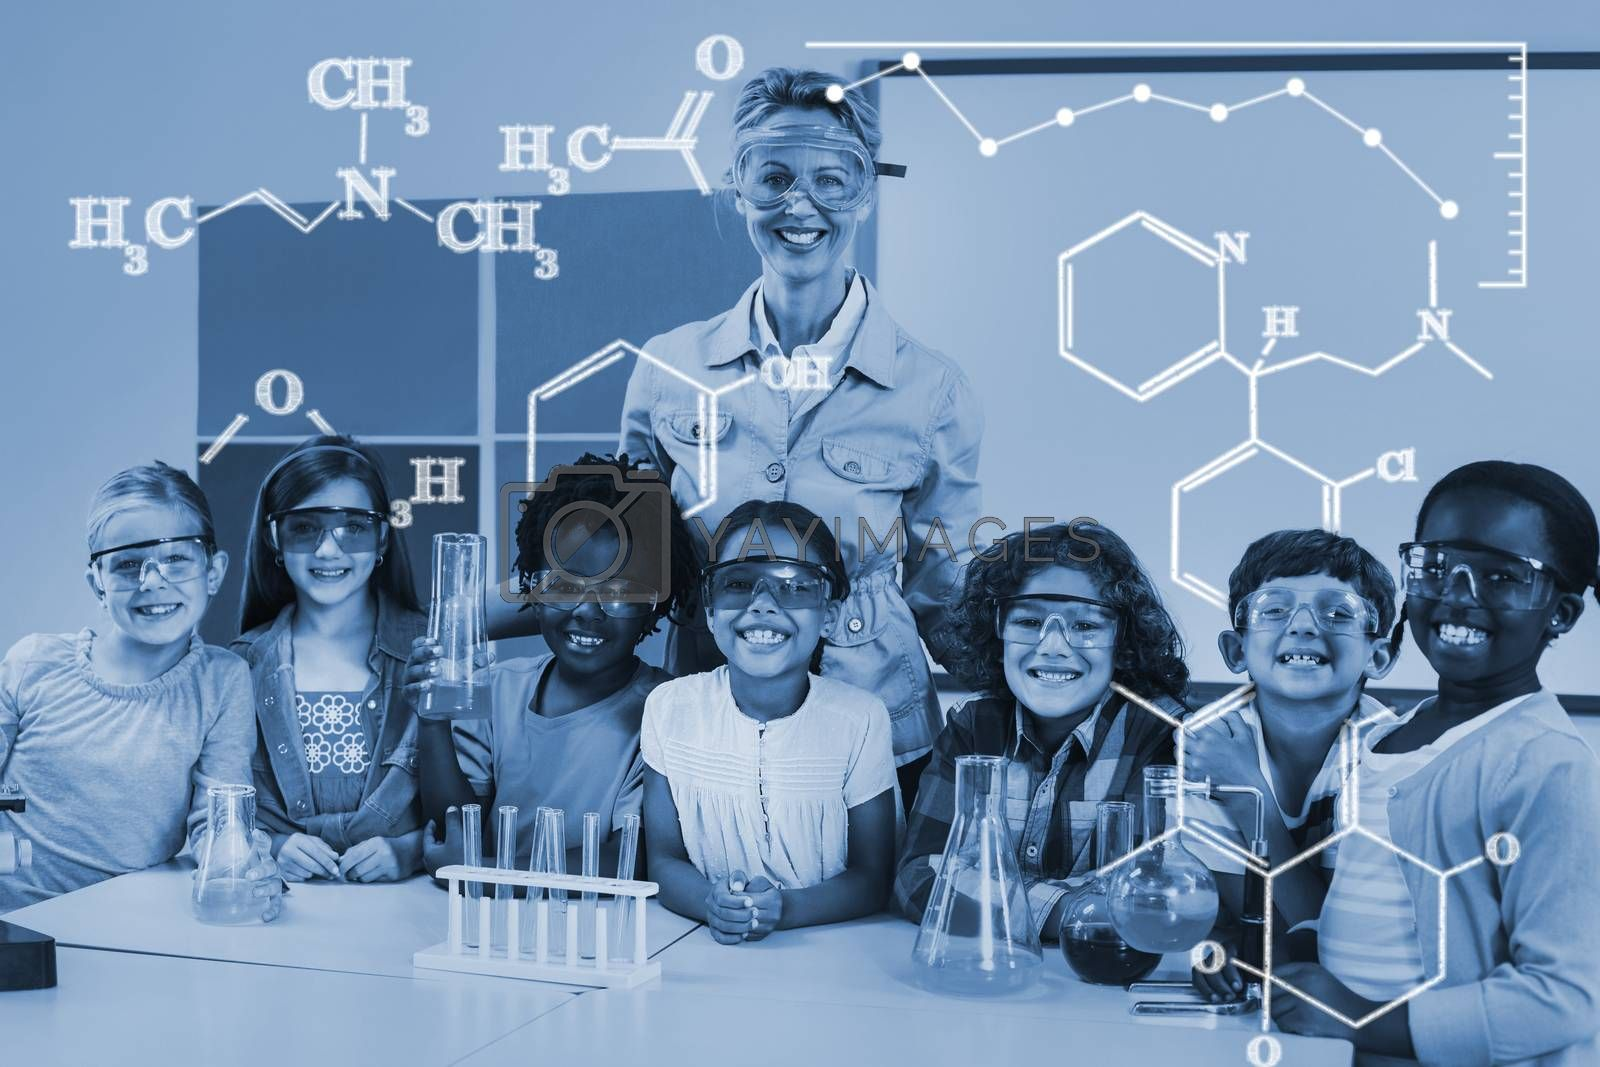 Composite image of digital image of chemical formulas by Wavebreakmedia